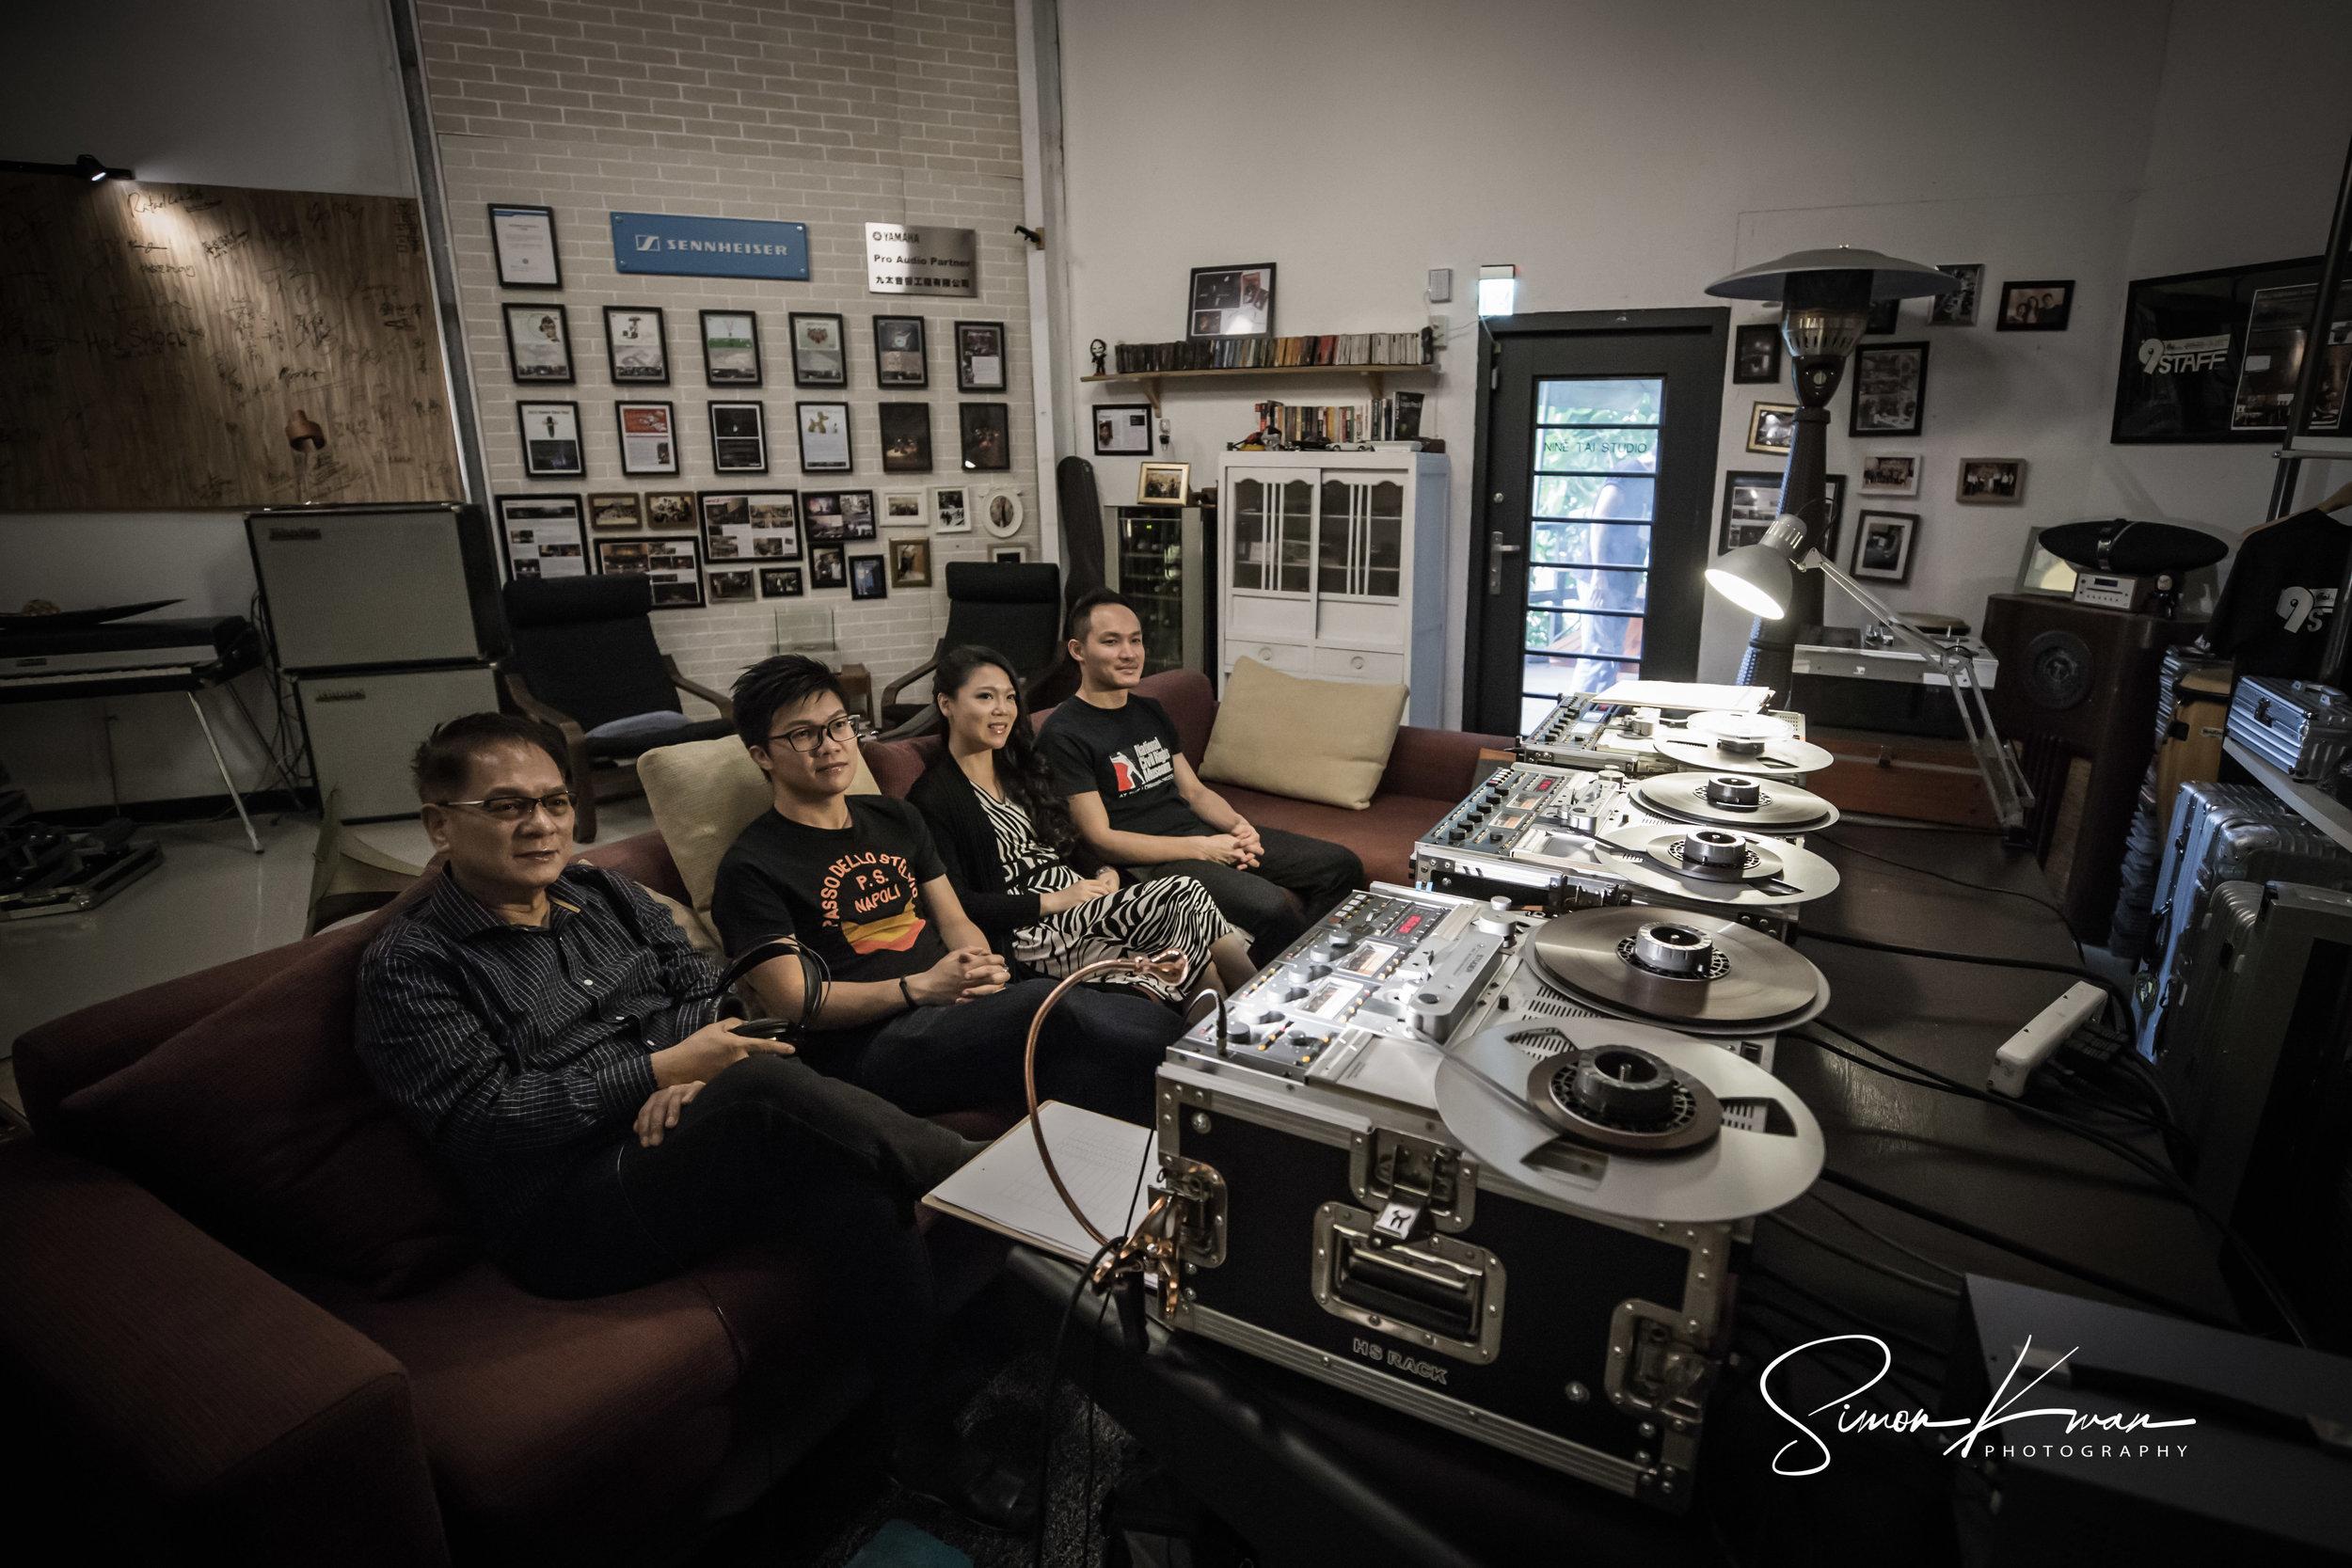 Album Recording Session Day 2 - Nine Tai Studio, Taipei23rd July, 2018